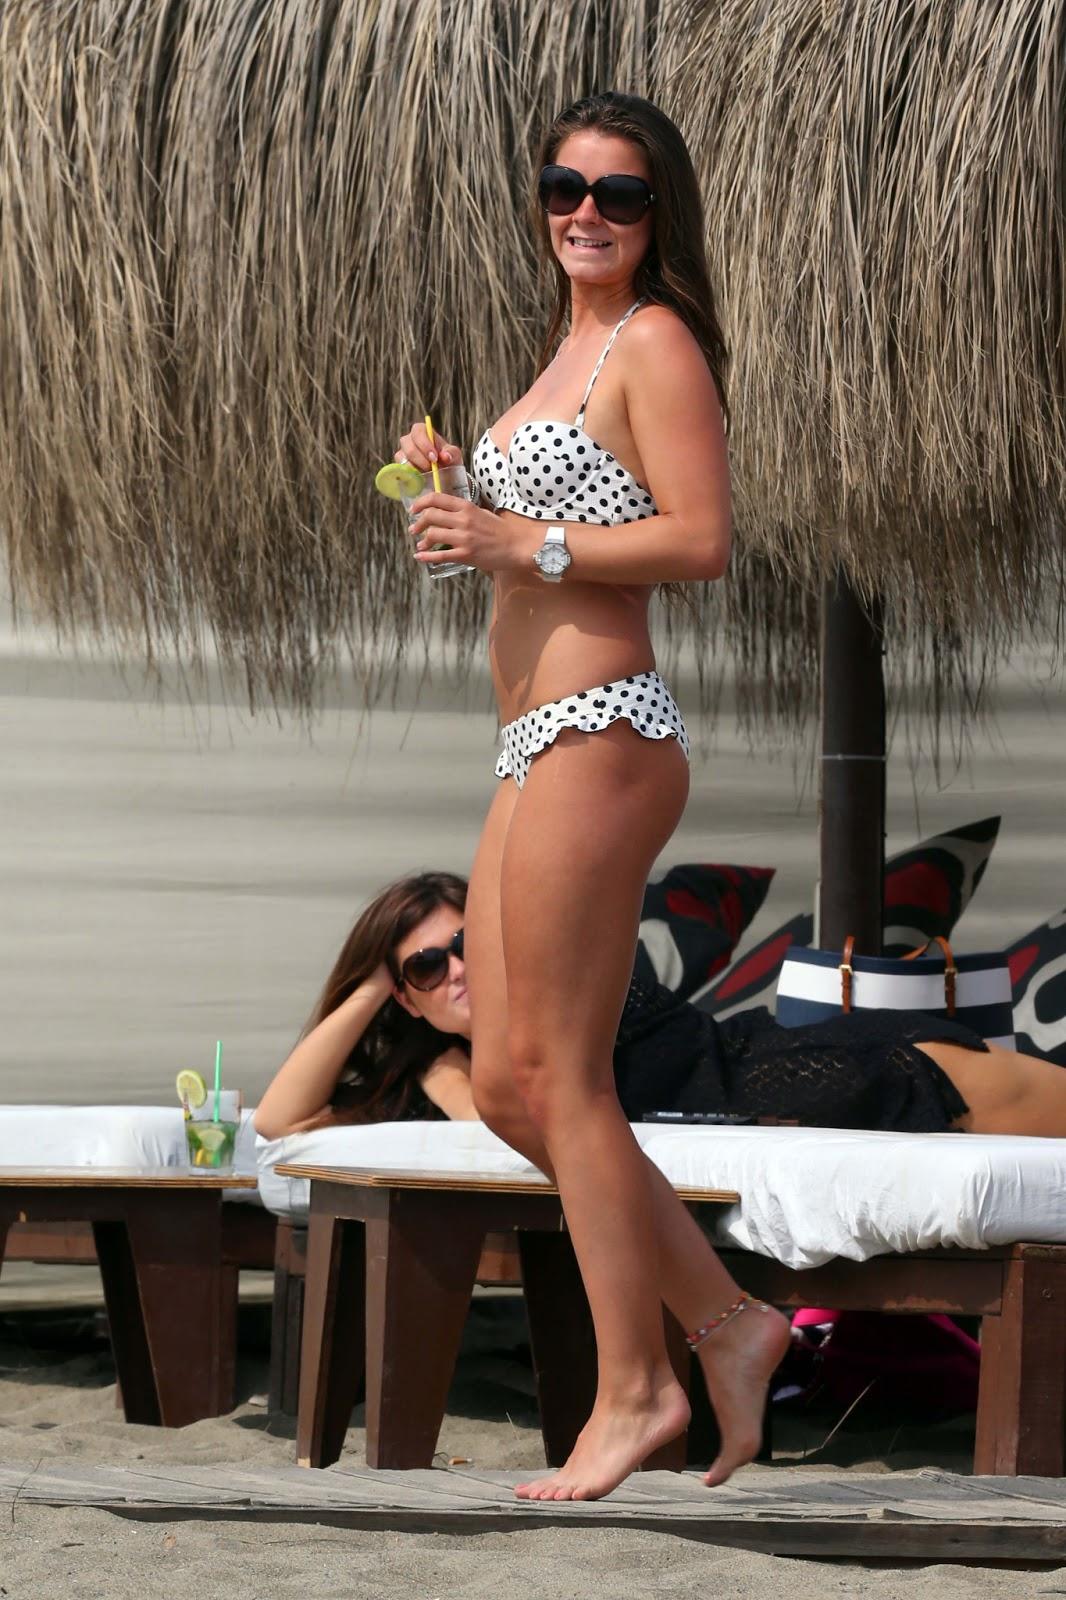 http://4.bp.blogspot.com/-uN43_MnpfN4/Ubo2iTMESRI/AAAAAAAAhLA/TBgN_ghMwO0/s1600/Brooke+Vincent+-+Polka+dot+Bikini+on+the+Beach+in+Spain-+June+2013-05.jpg